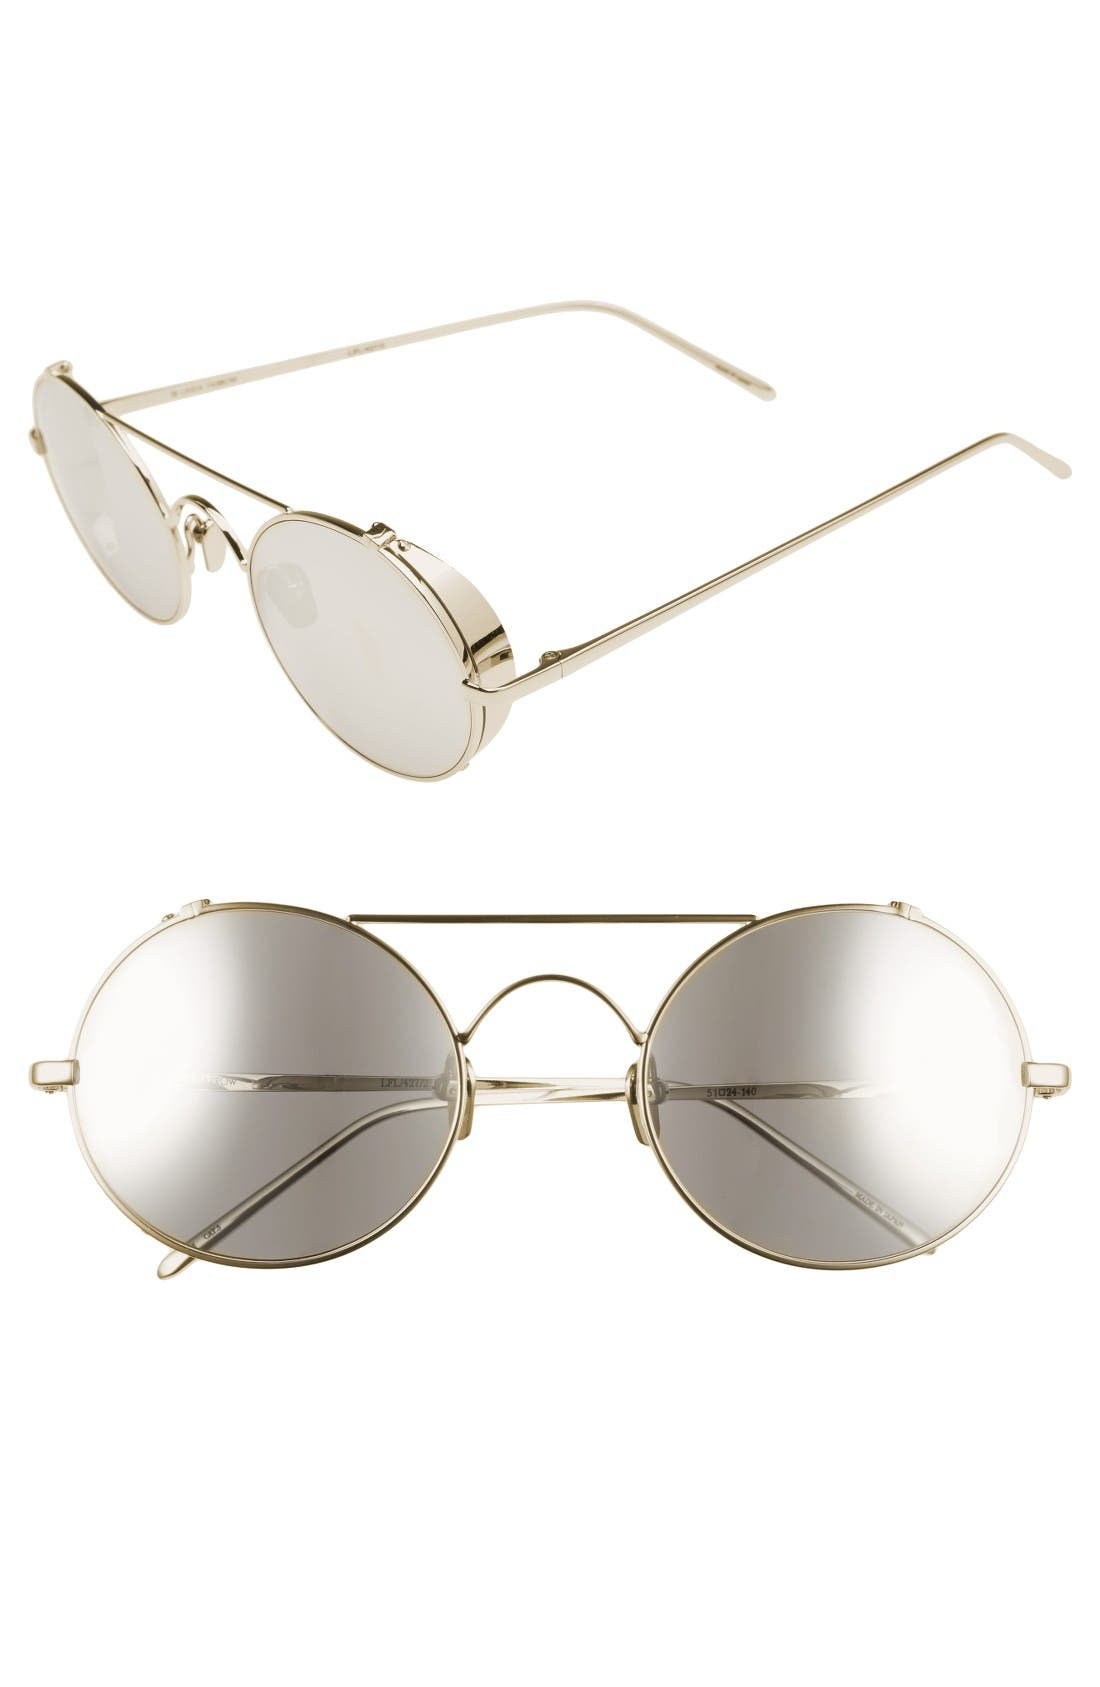 51mm Oval Sunglasses,                         Main,                         color, White Gold/ Platinum